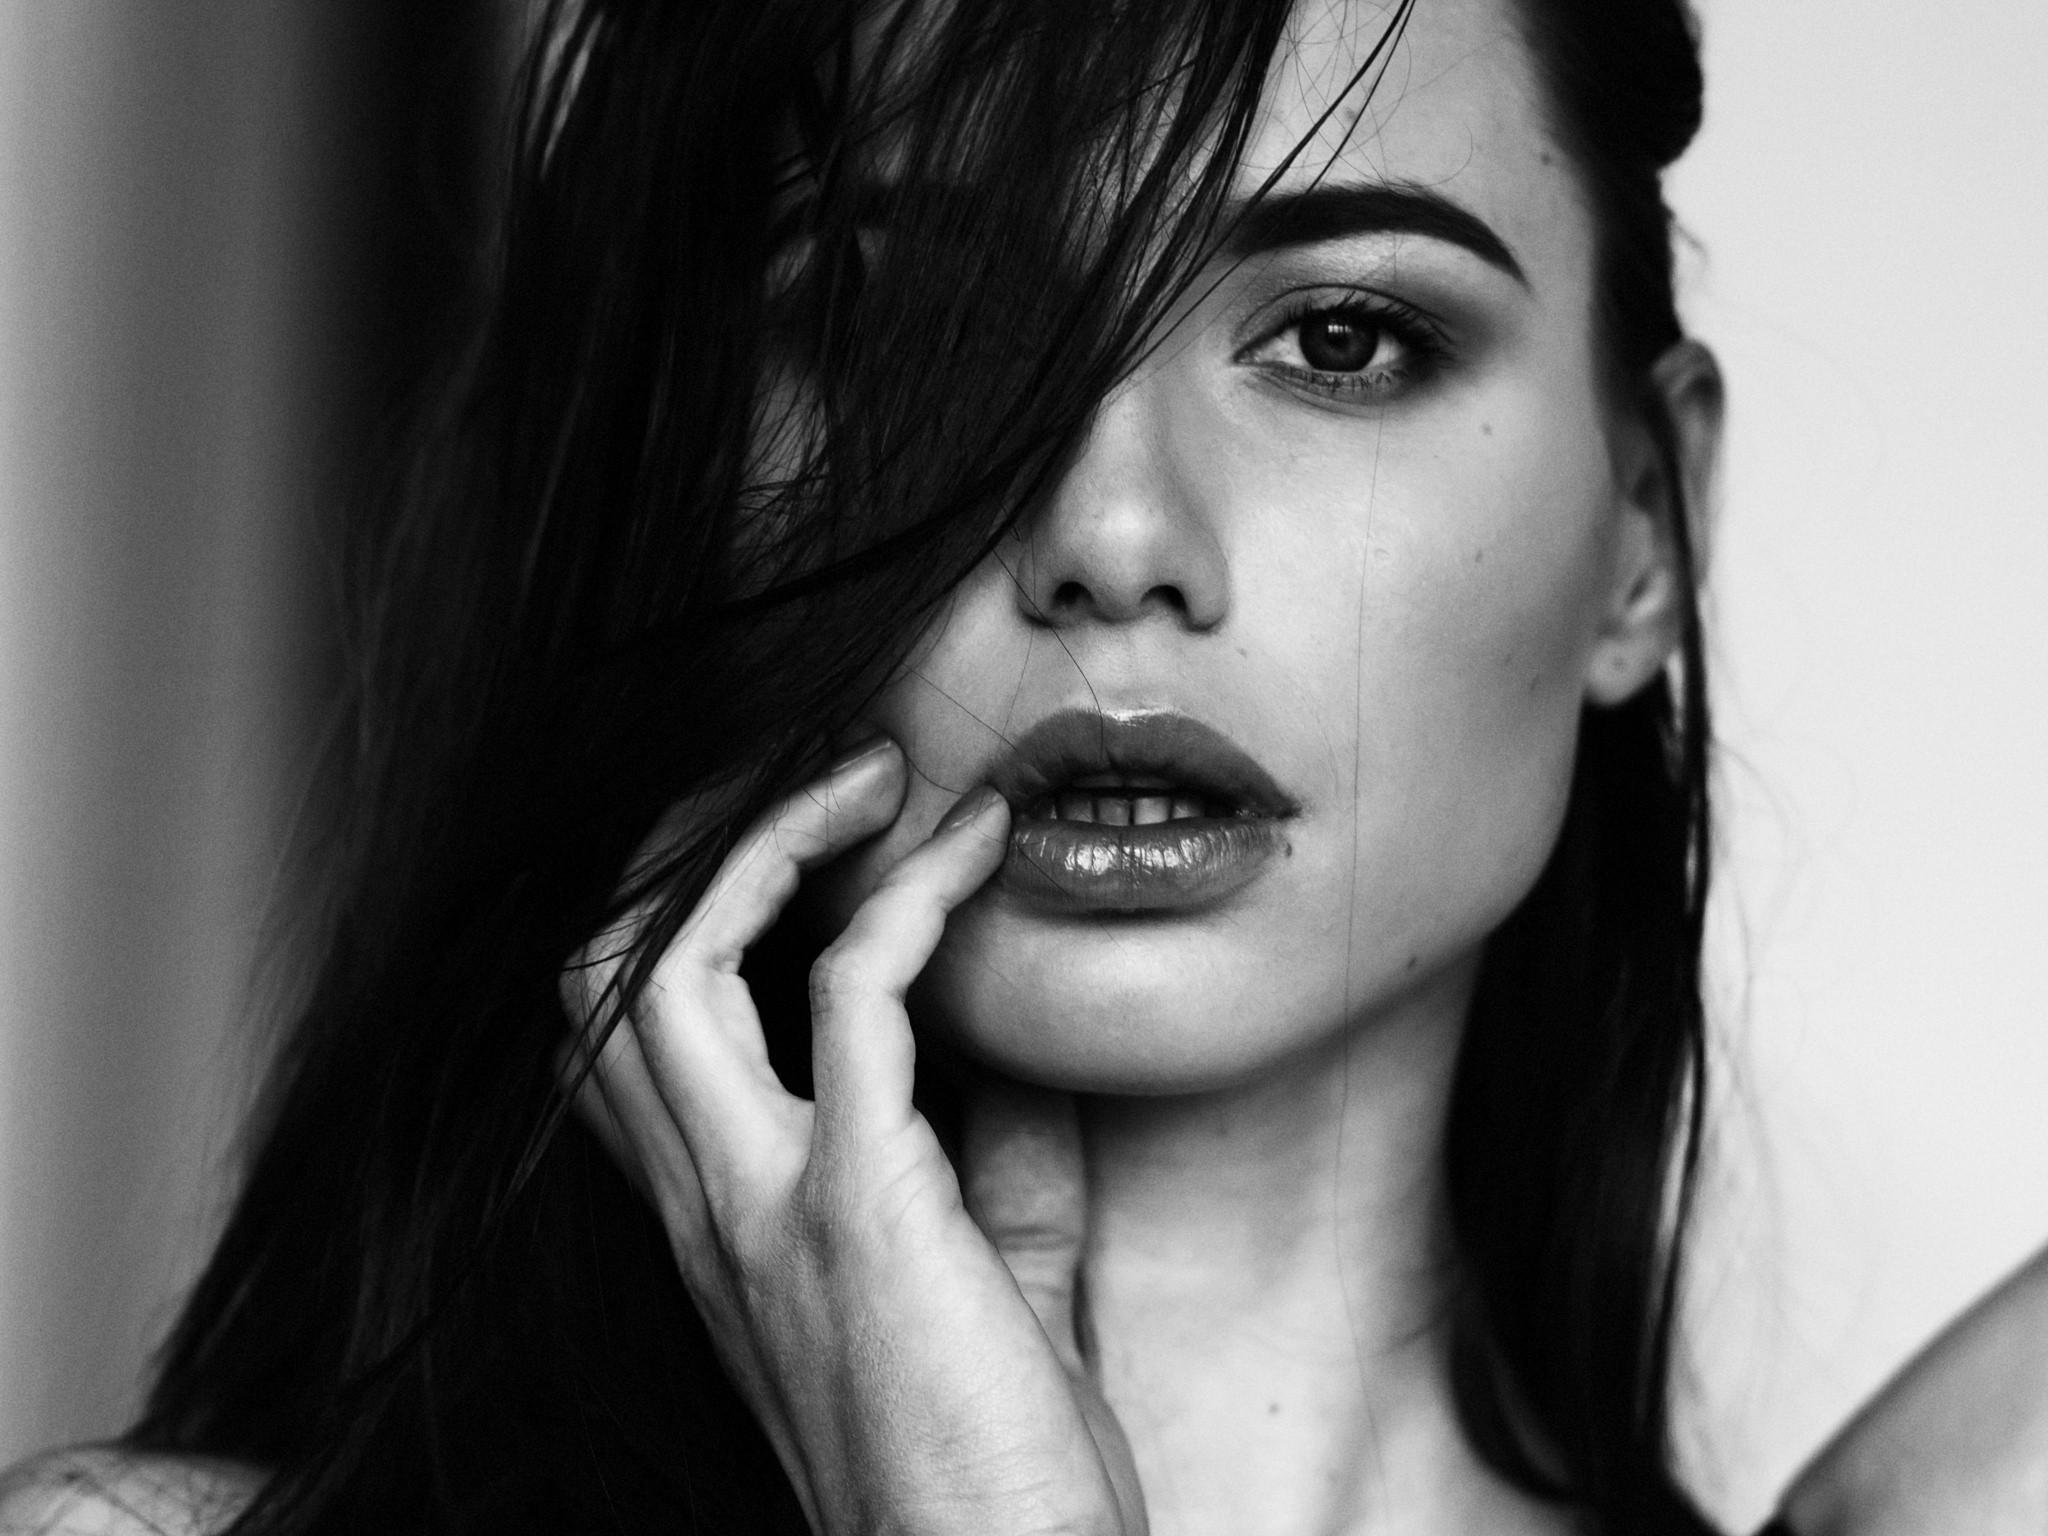 wallpaper face women model long hair brunette mouth emotion person skin head girl. Black Bedroom Furniture Sets. Home Design Ideas